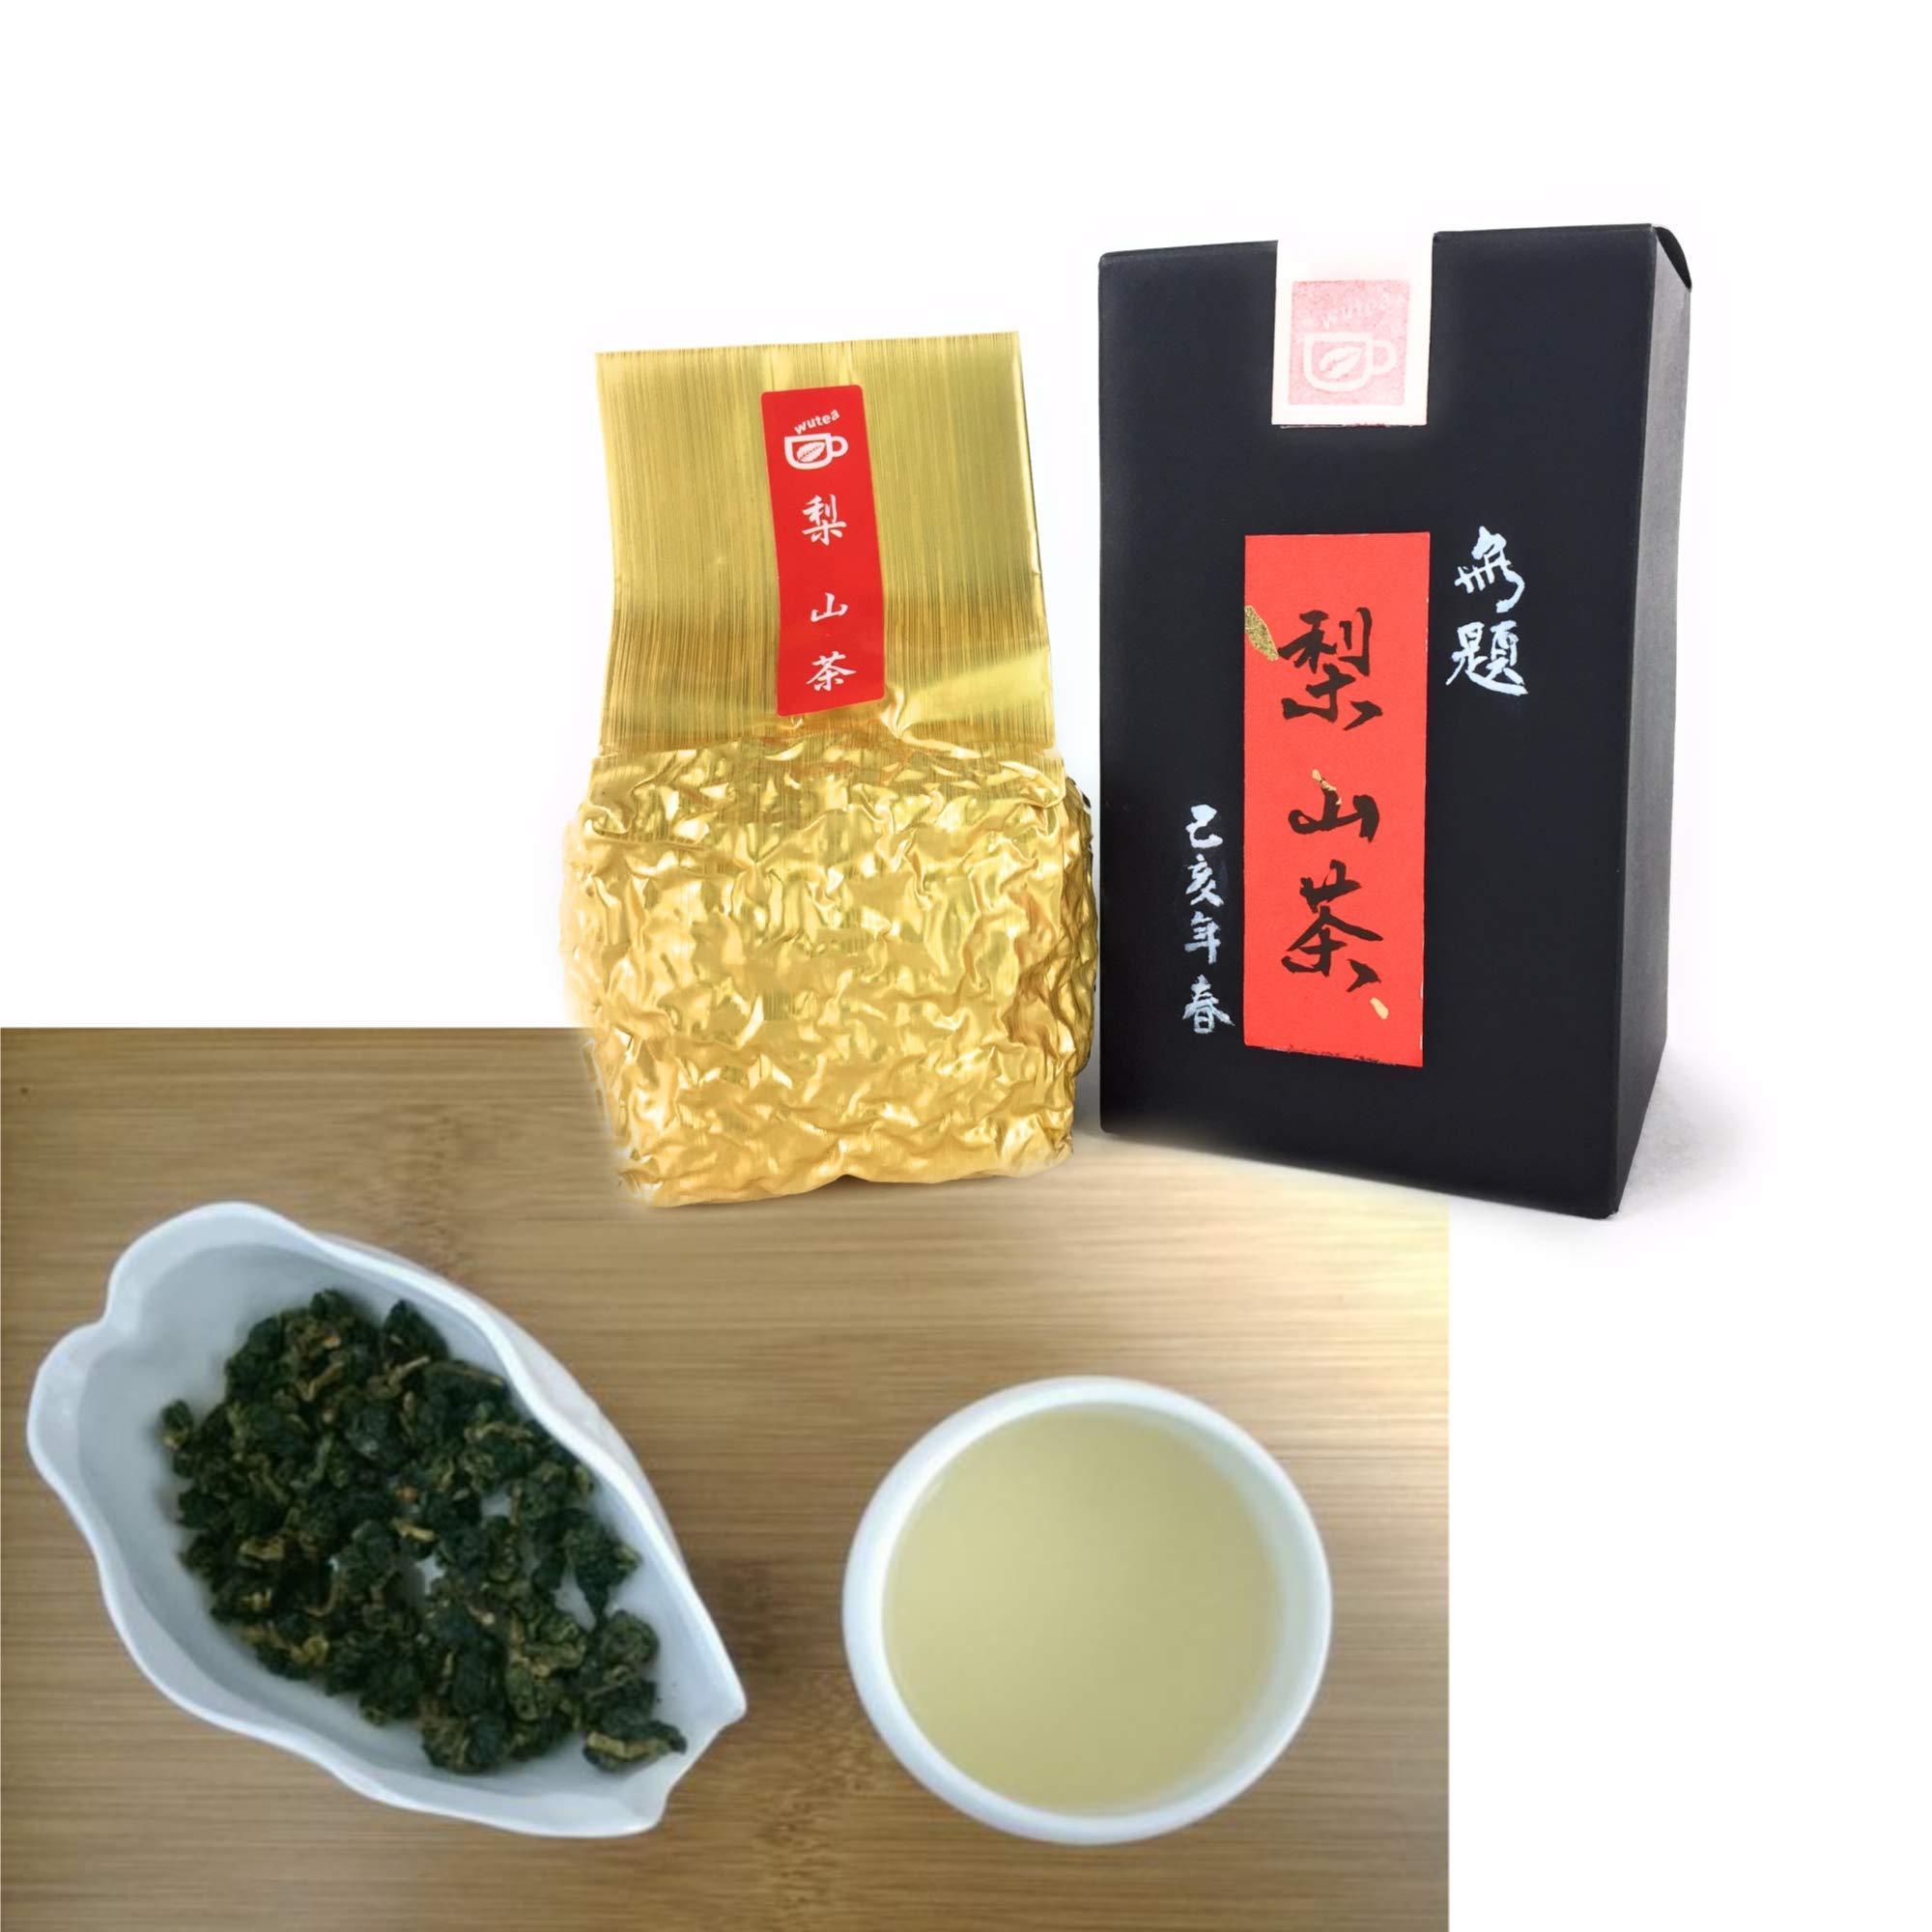 Tepacito Oolong Tea Loose Leaf Taiwan Lishan High Mountain Tea Handpicked Premium Grade Natural Pure Authentic Fresh No Additives Flavors Essences